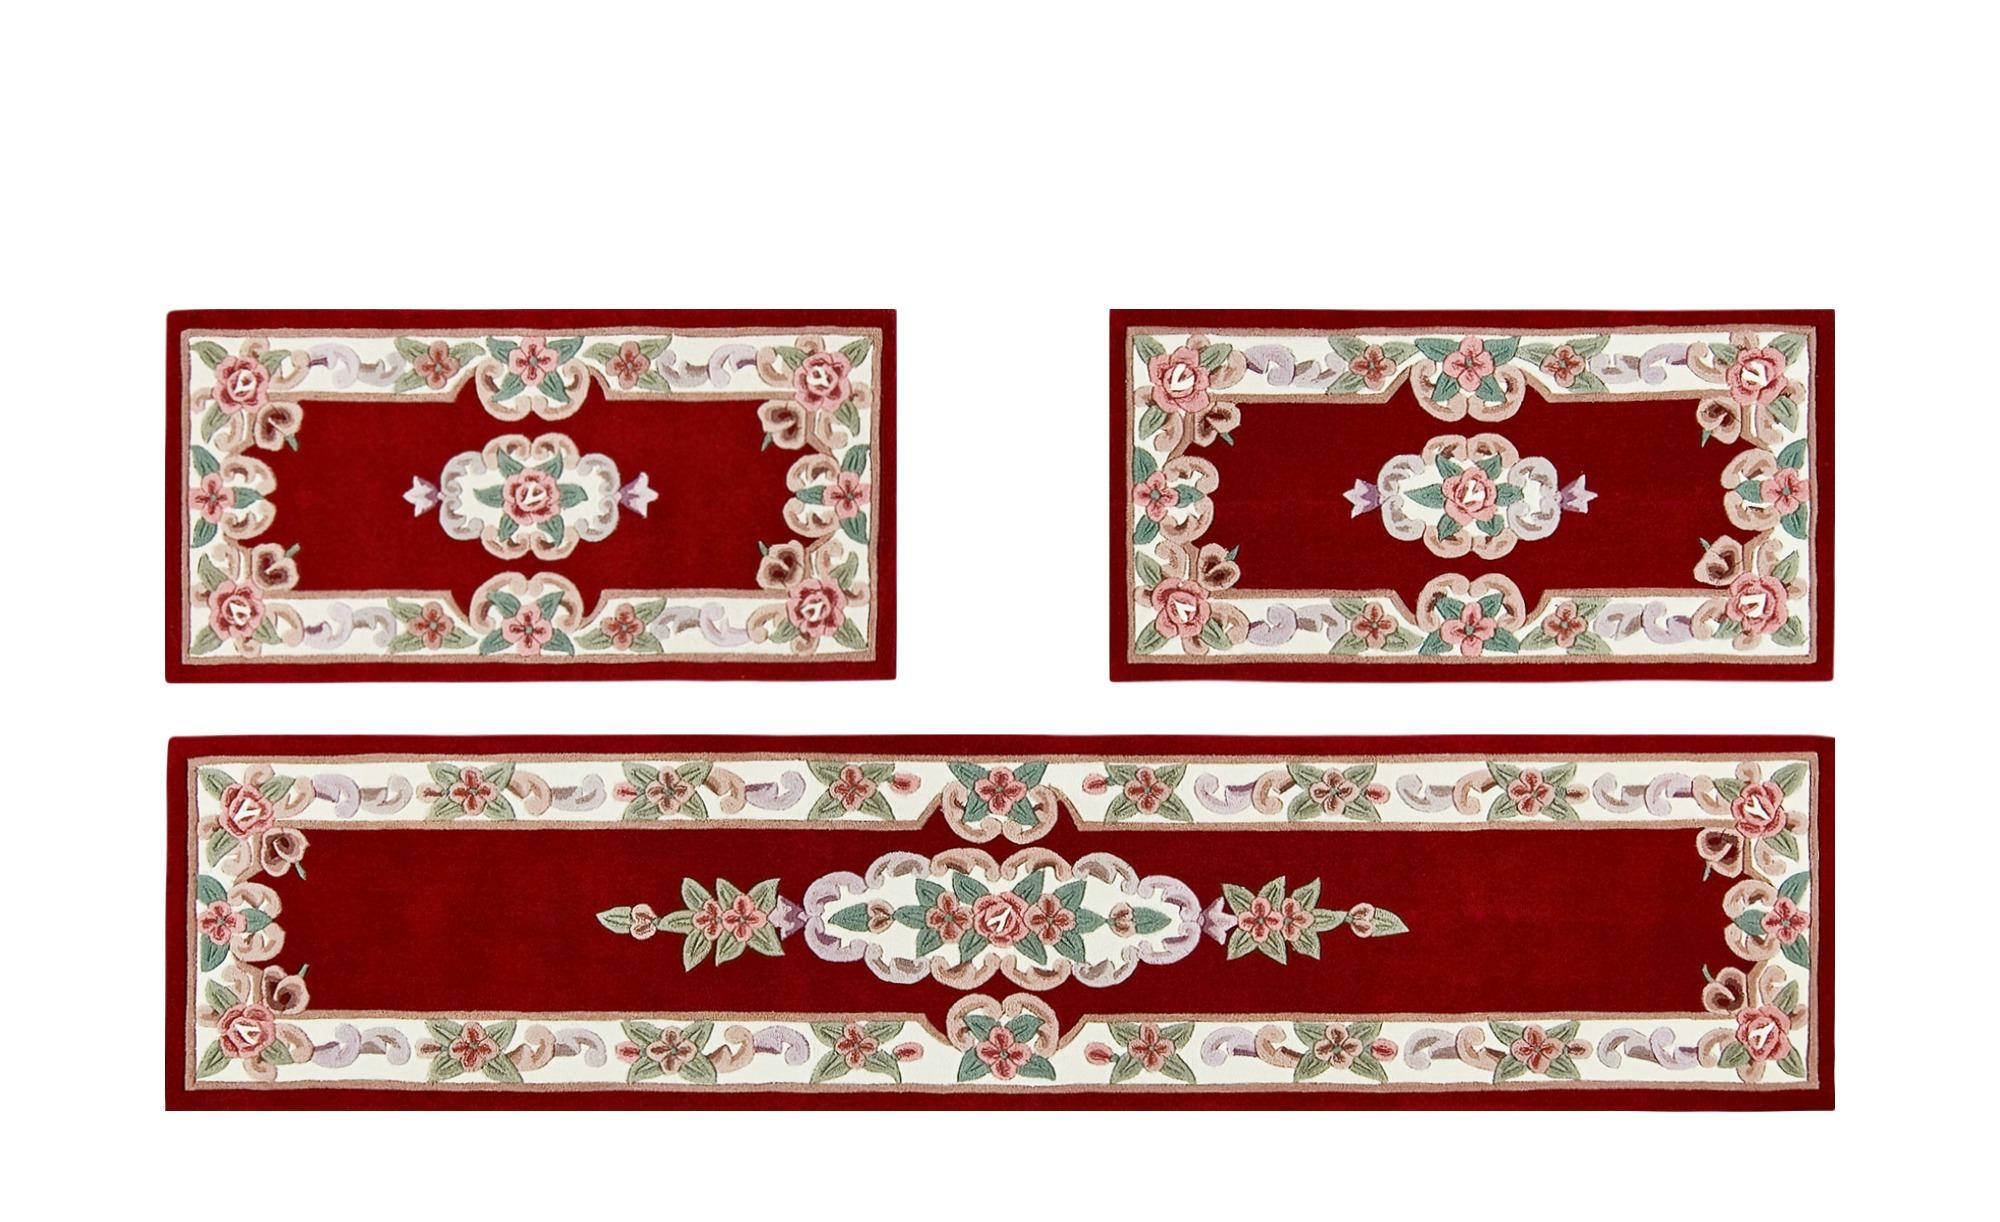 Bettumrandung  Ming ¦ rot ¦ 100 % Polyacryl ¦ Maße (cm): B: 70 T: 320 Teppiche > Wohnteppiche - Höffner